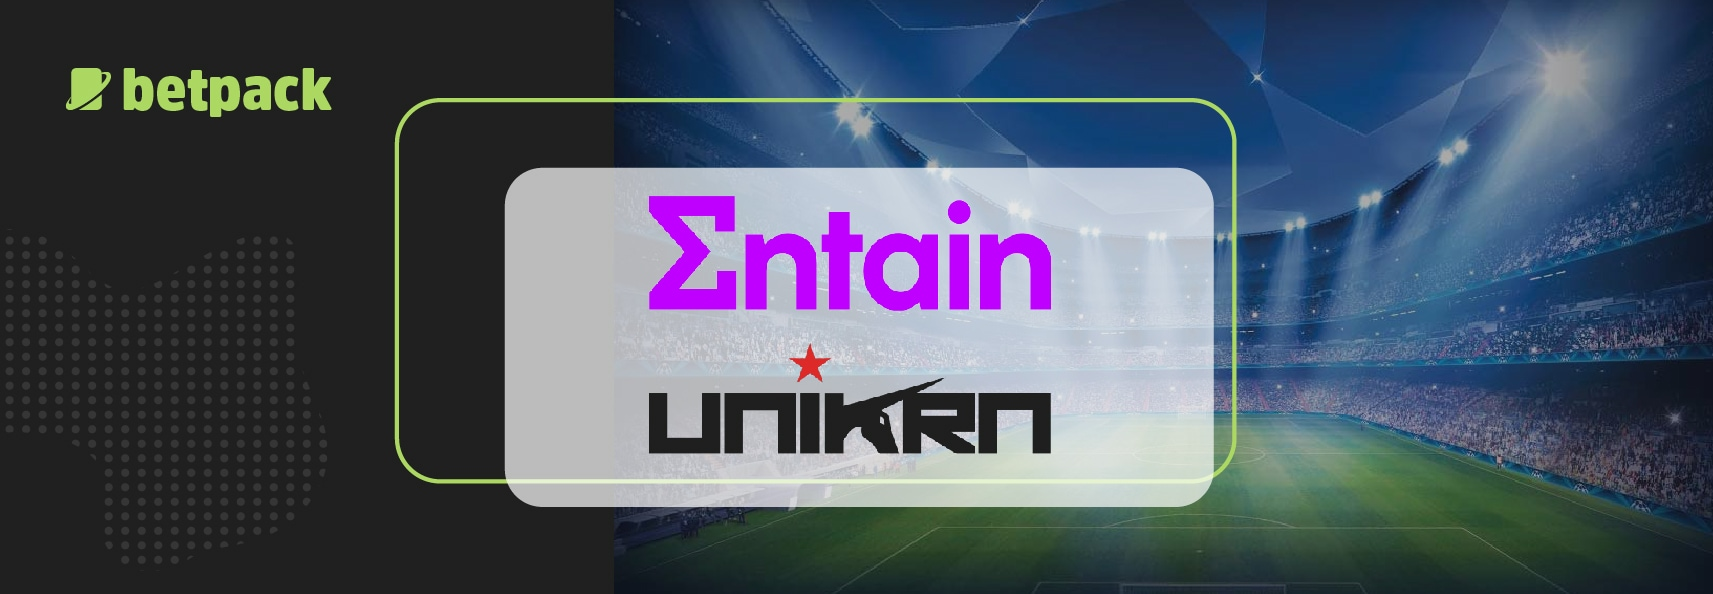 Entain make big move as they acquire esports company Unikrn